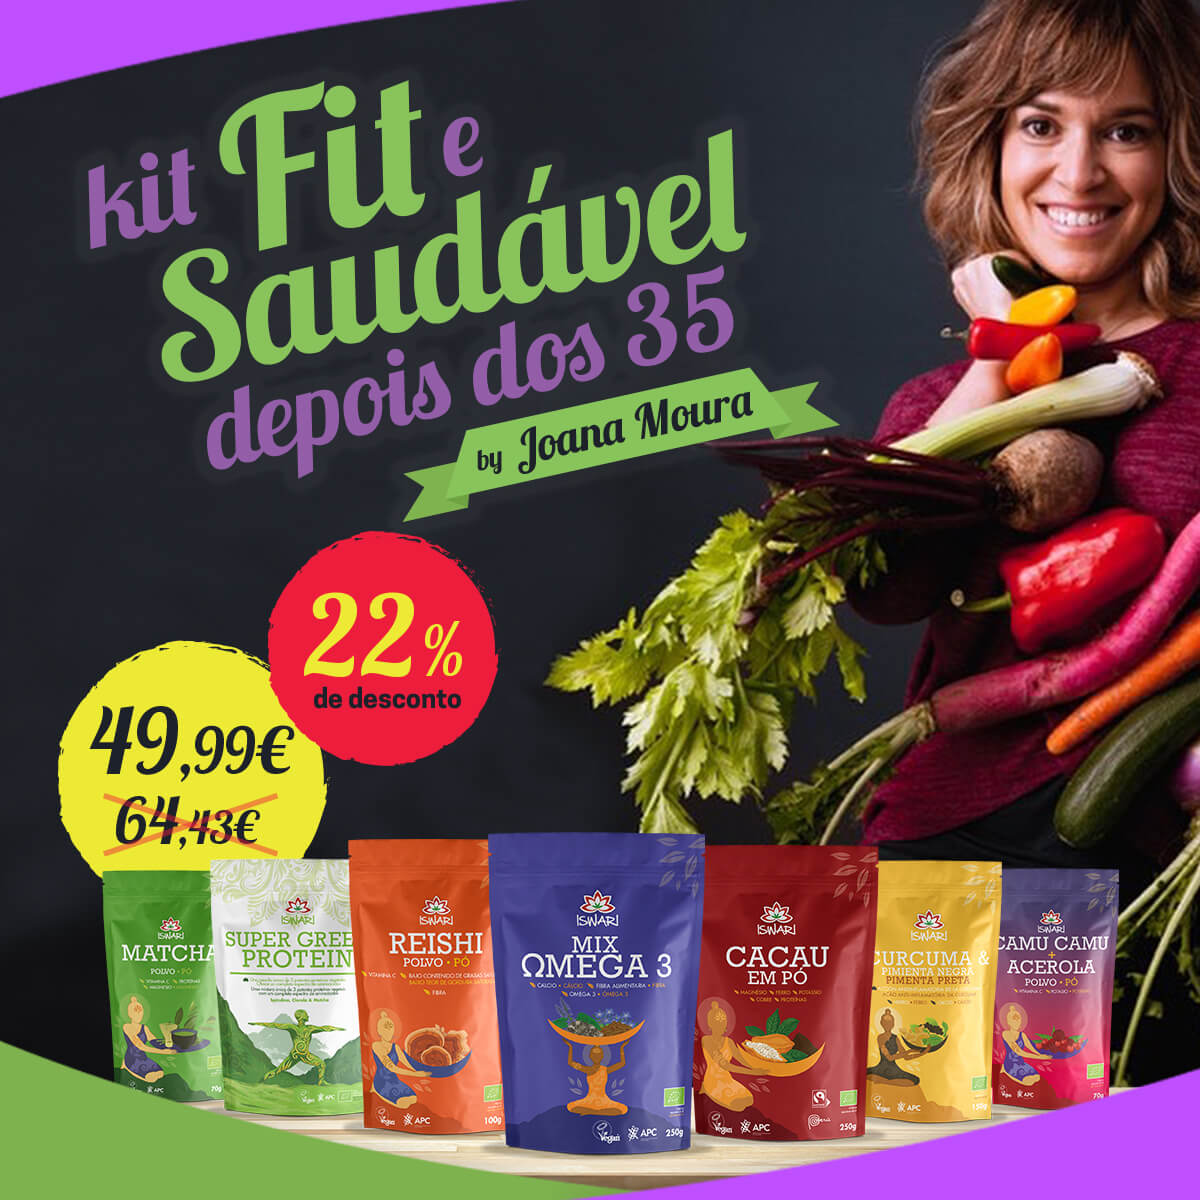 Kit Fit e Saudável depois dos 35 by Joana Moura 1